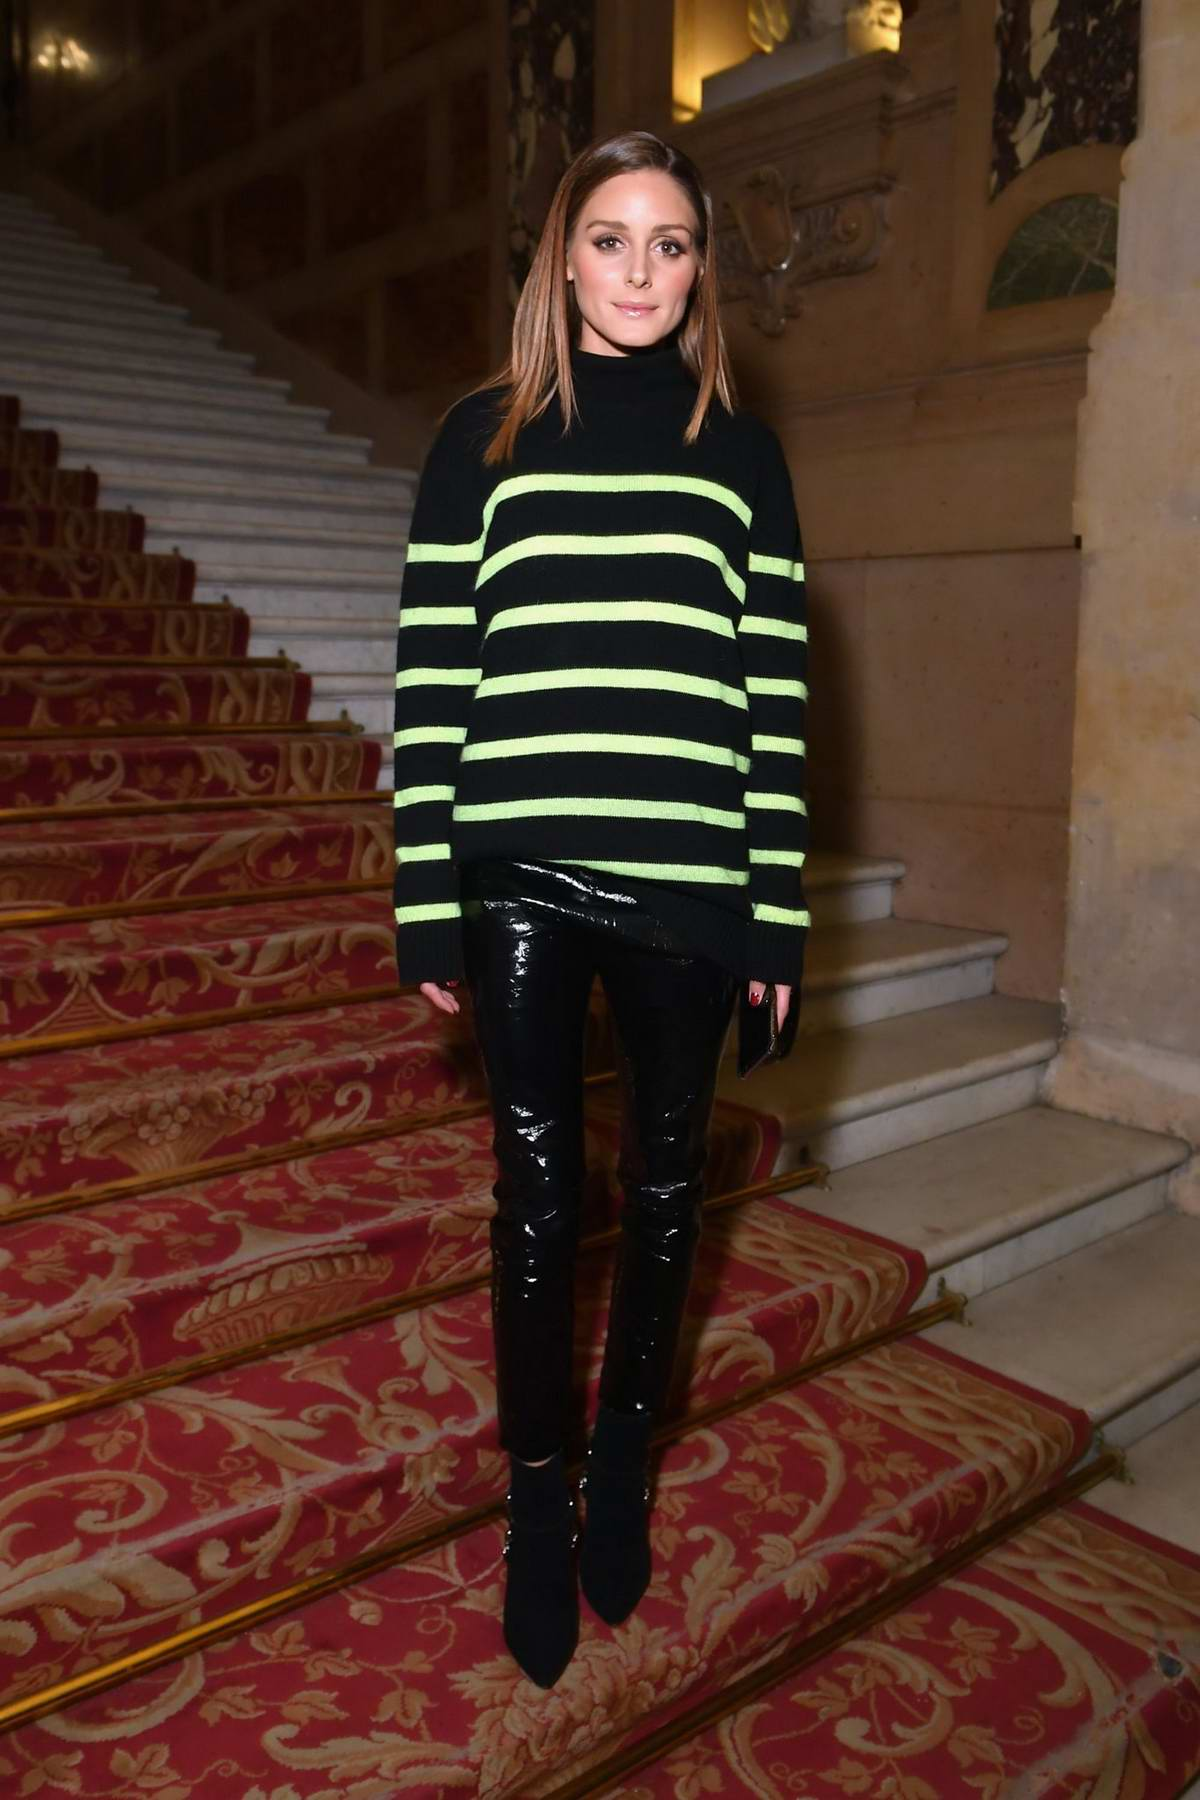 Olivia Palermo attends the Balmain Show during Paris Fashion Week in Paris, France